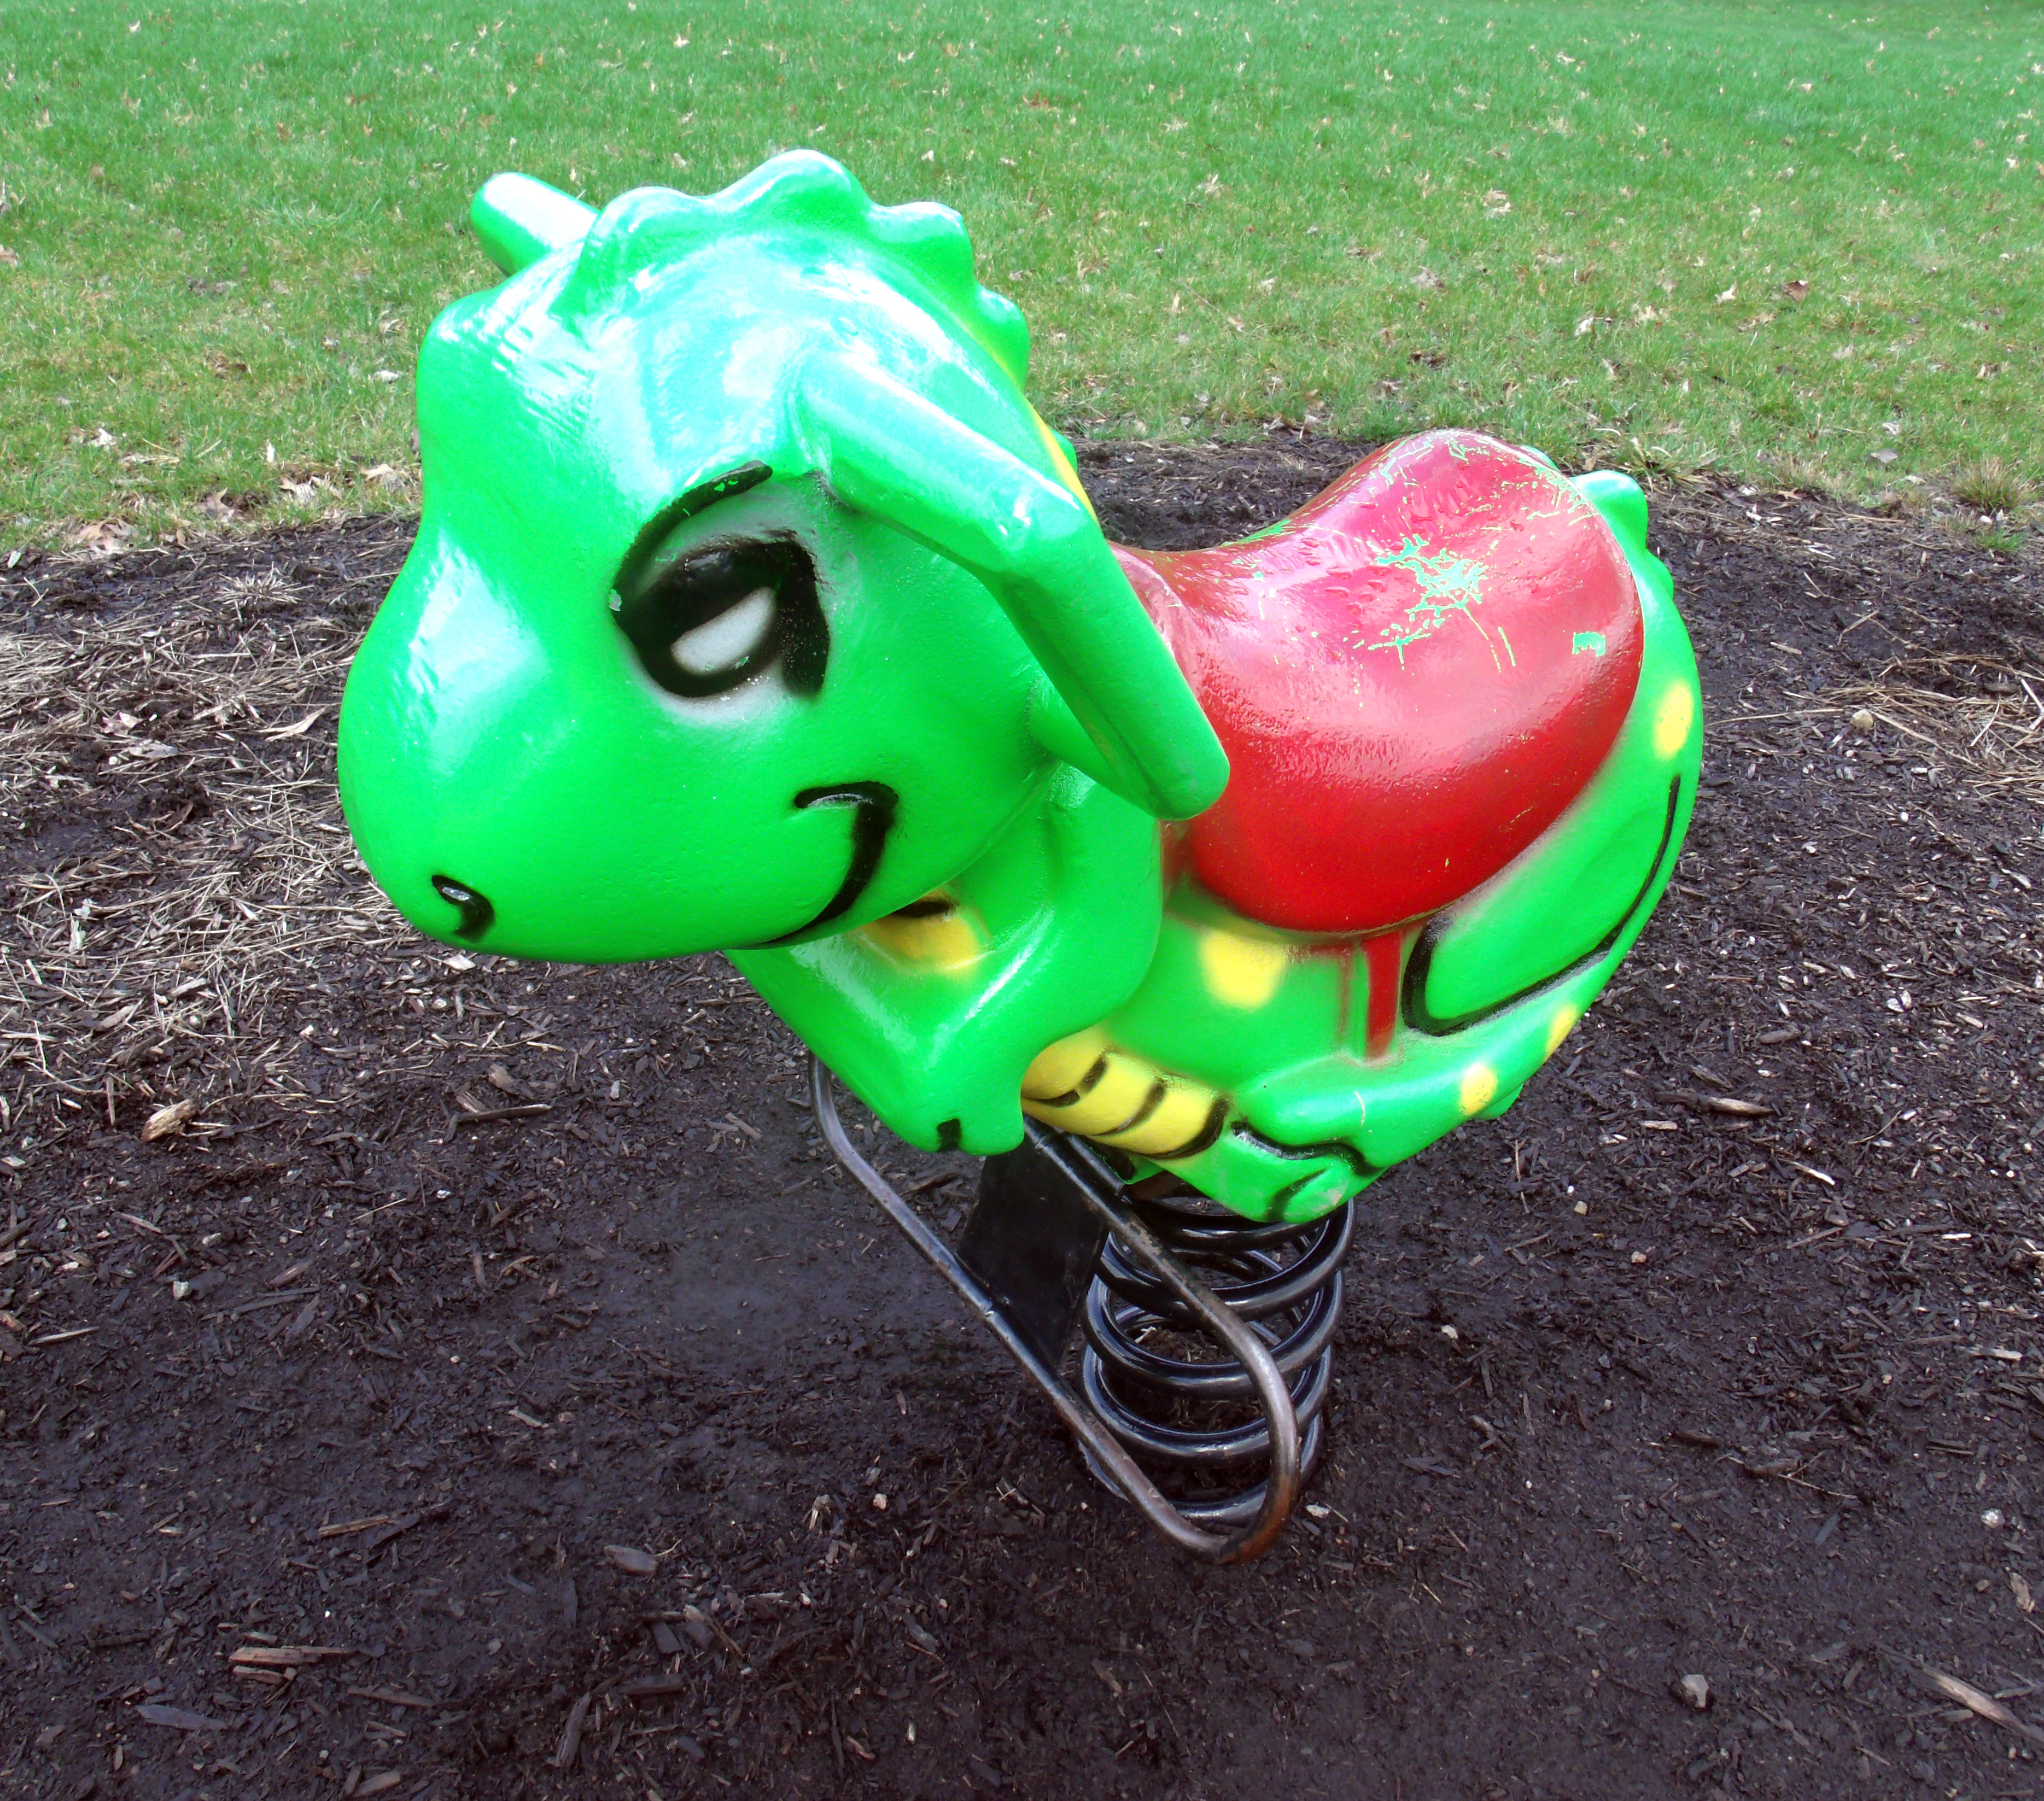 Green playground rocking dinosaur, Dinosaur, Green, Playground, Rocking, HQ Photo